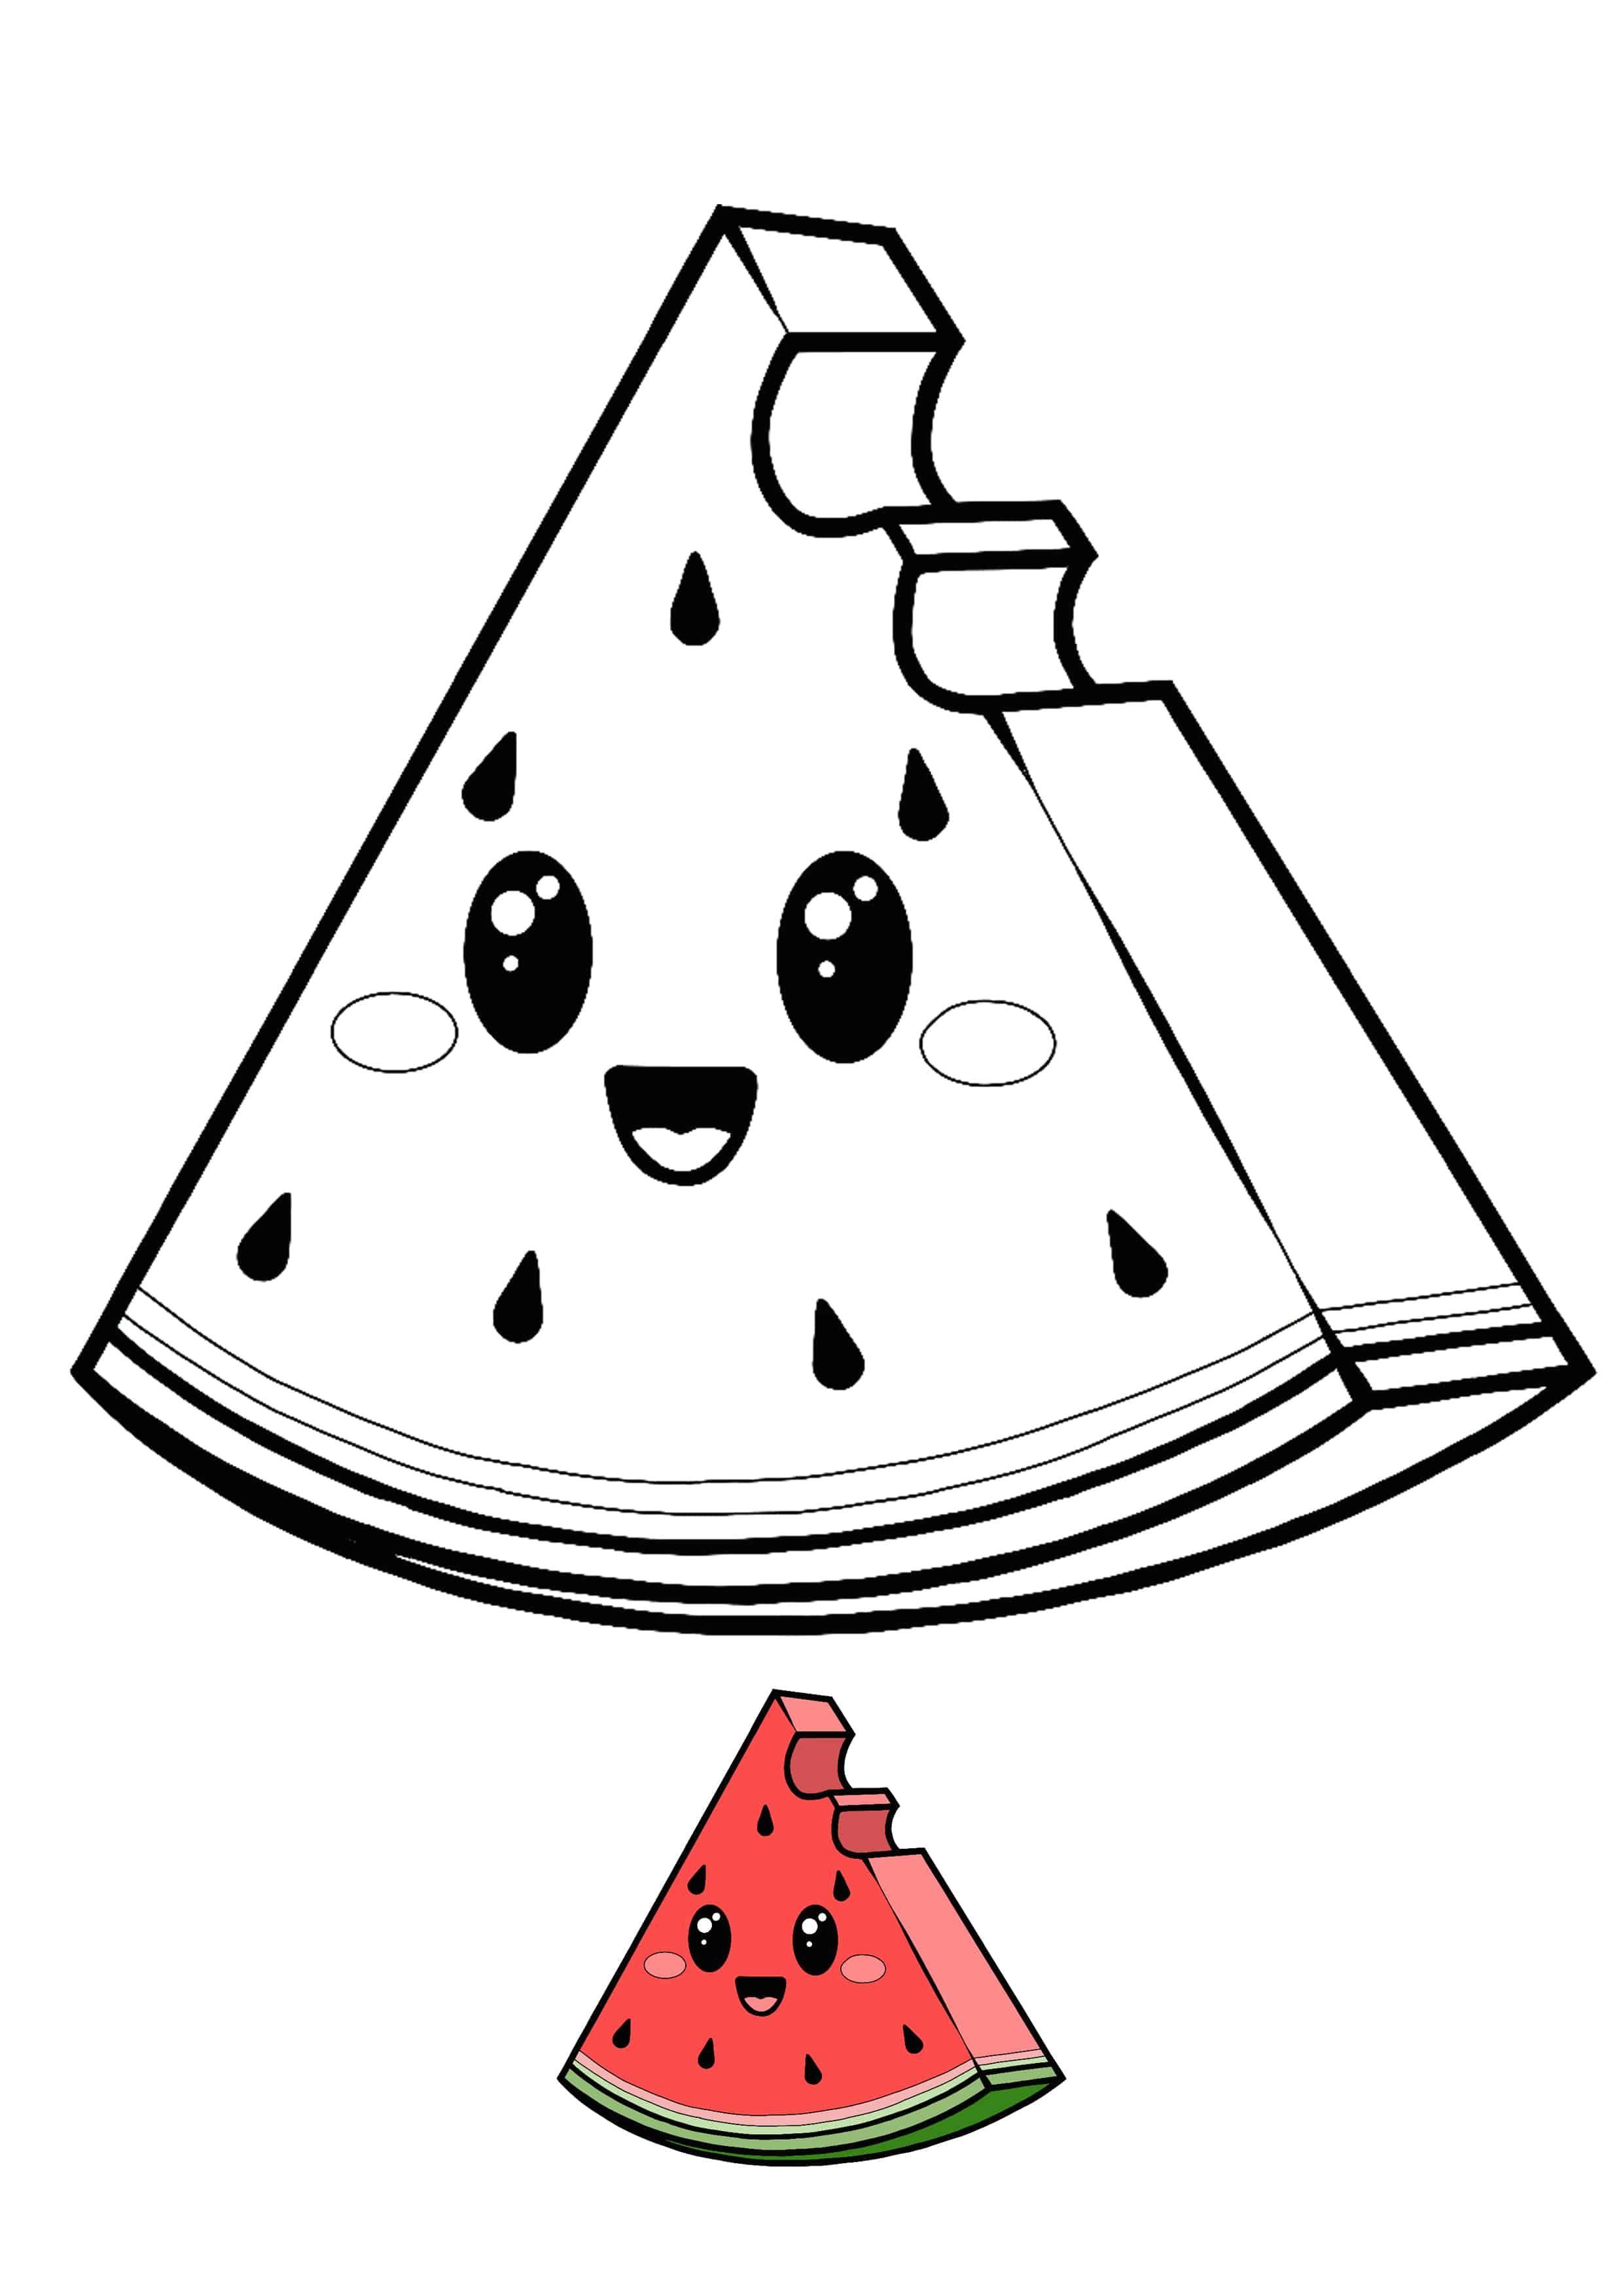 Coloring Pages Of Kawaii Food Printable